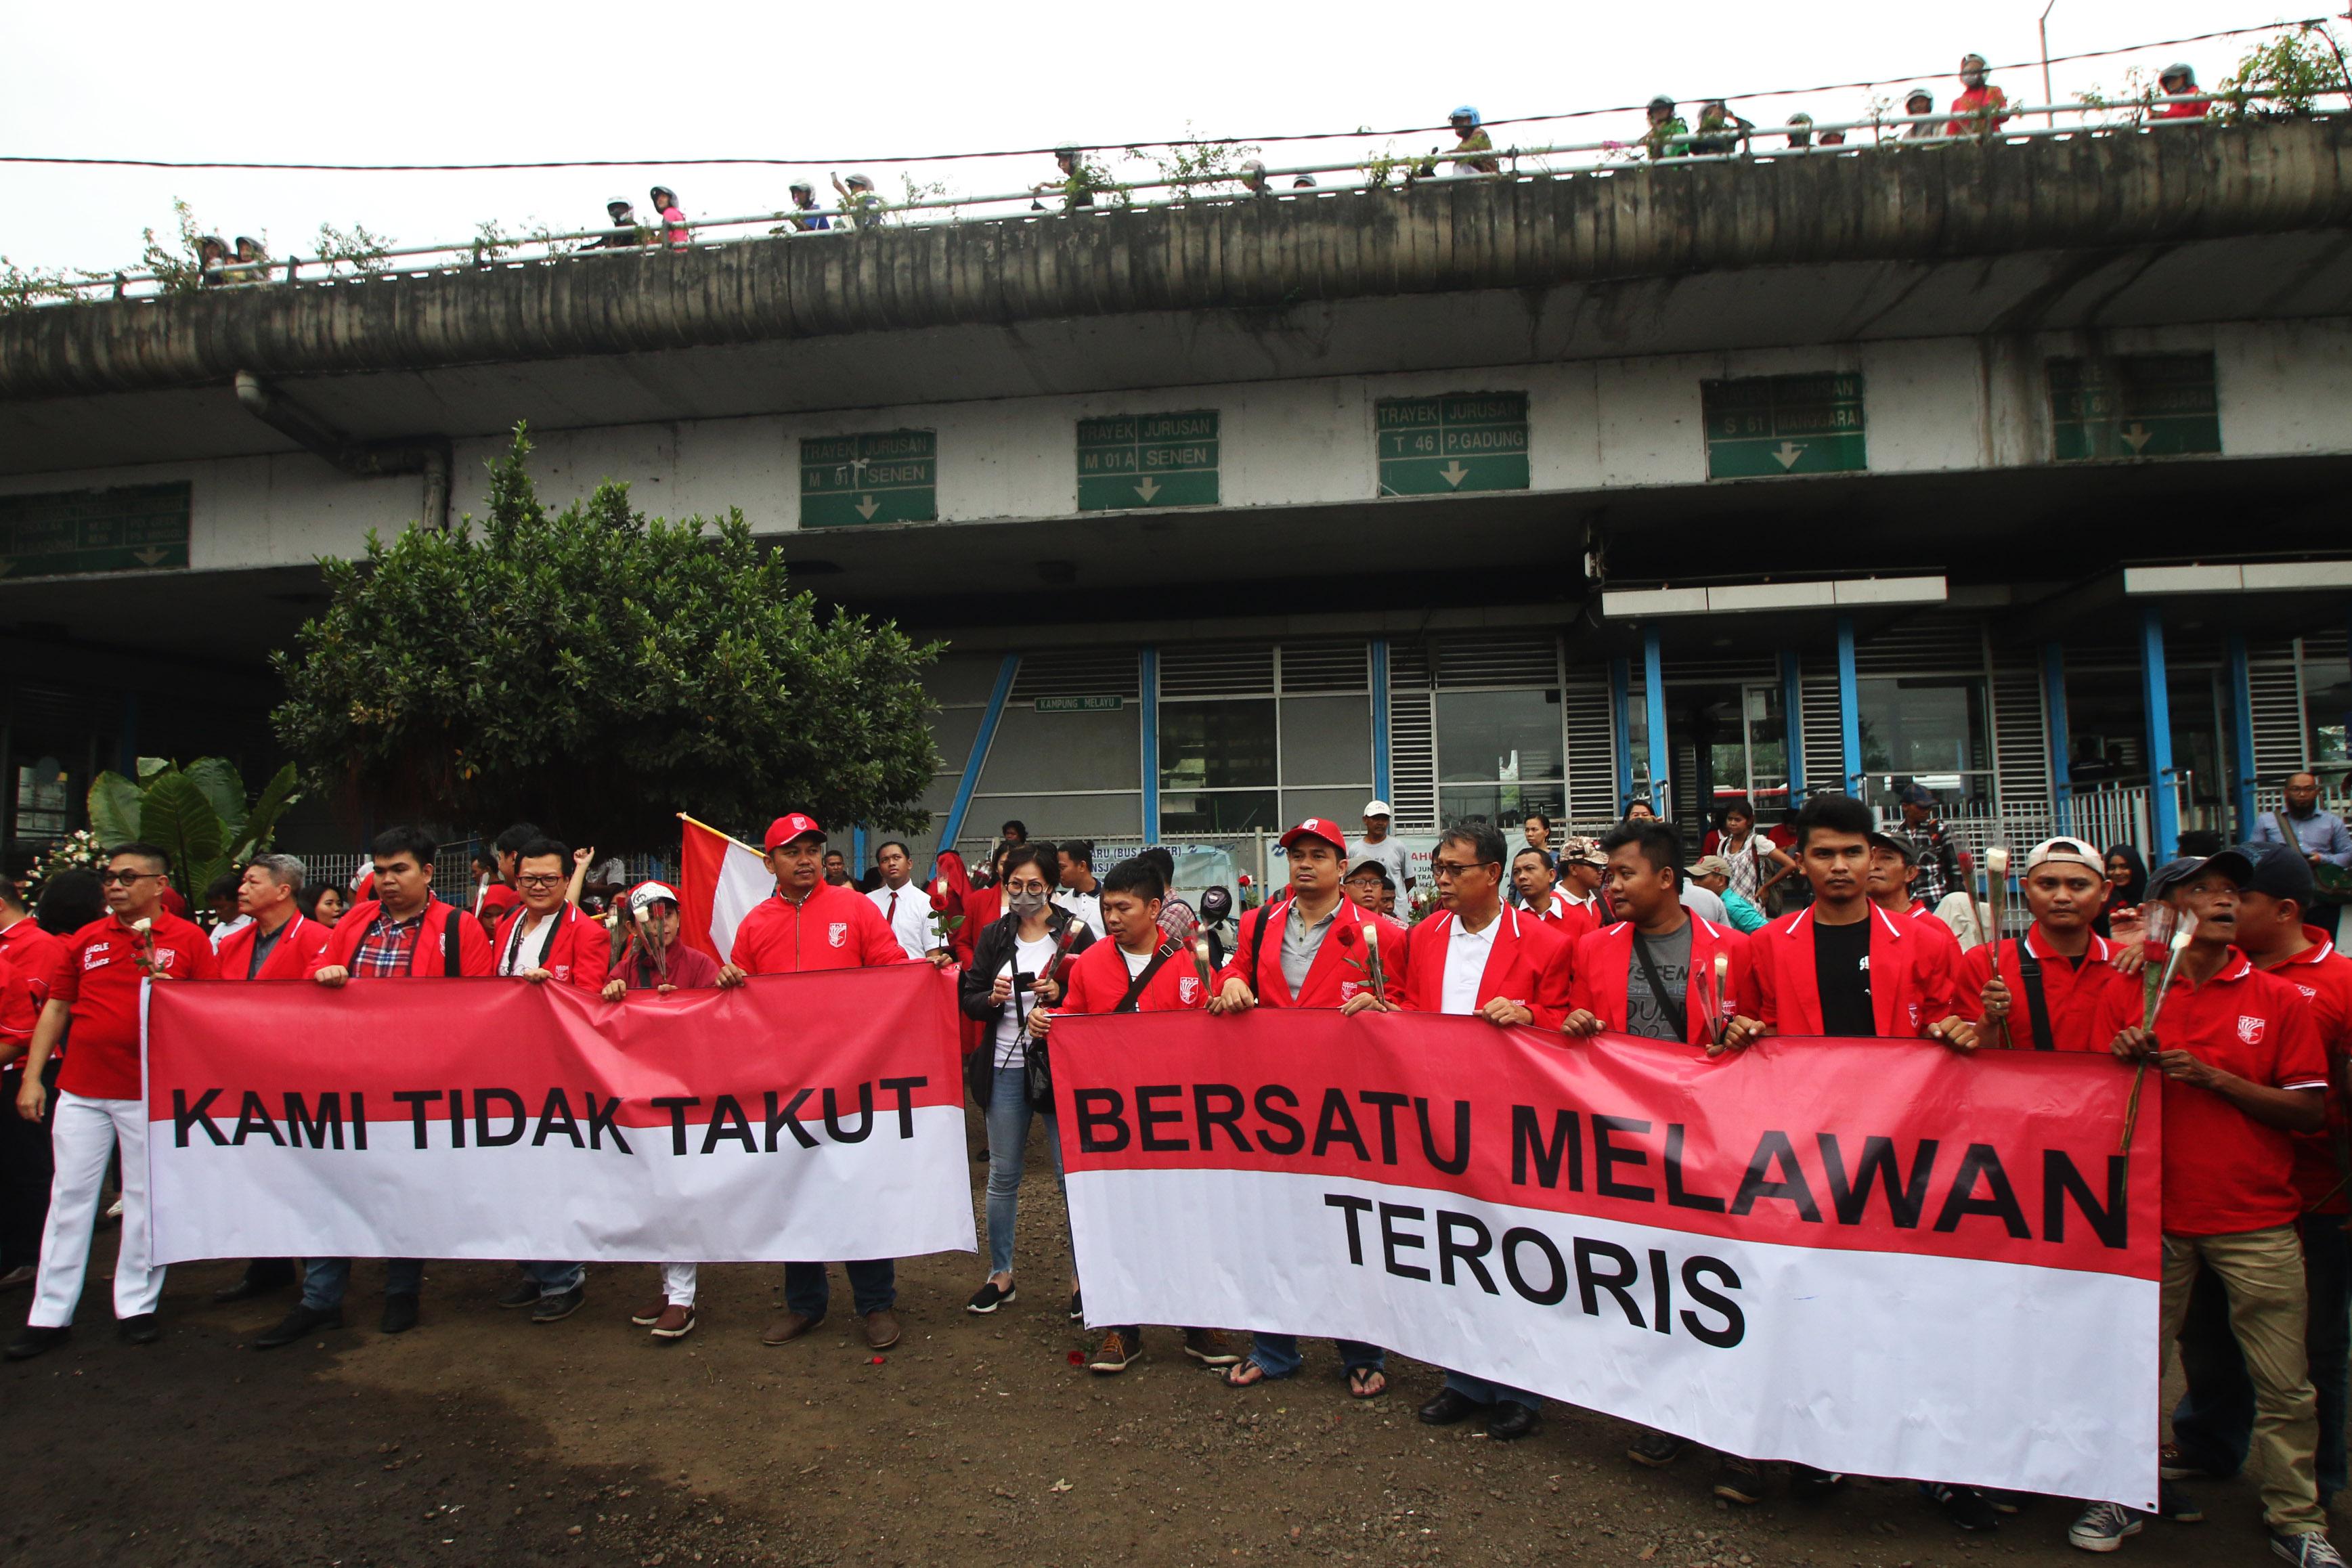 Simpatisan dan keluarga korban bom Kampung Melayu melakukan aksi simpatik di Terminal Kampung Melayu, Jakarta, pada 28 Mei 2017. Foto oleh Rivan Awal Lingga/Antara